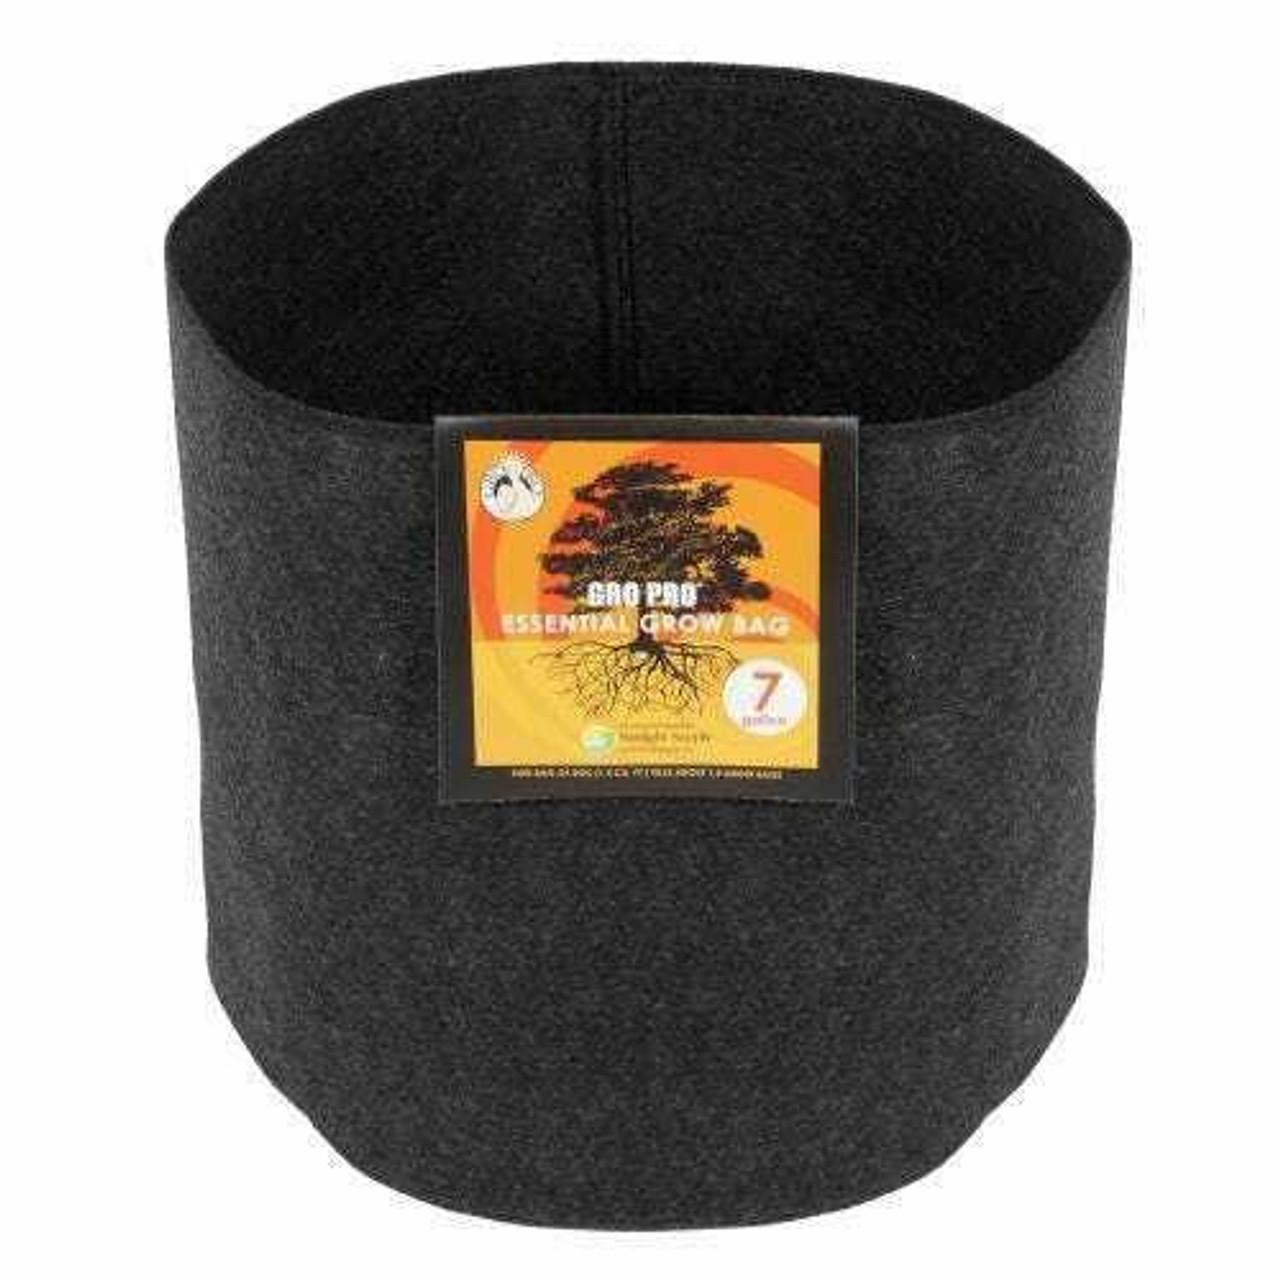 Gro Pro Essential Round Fabric Pot - Black 7 Gallon - 1